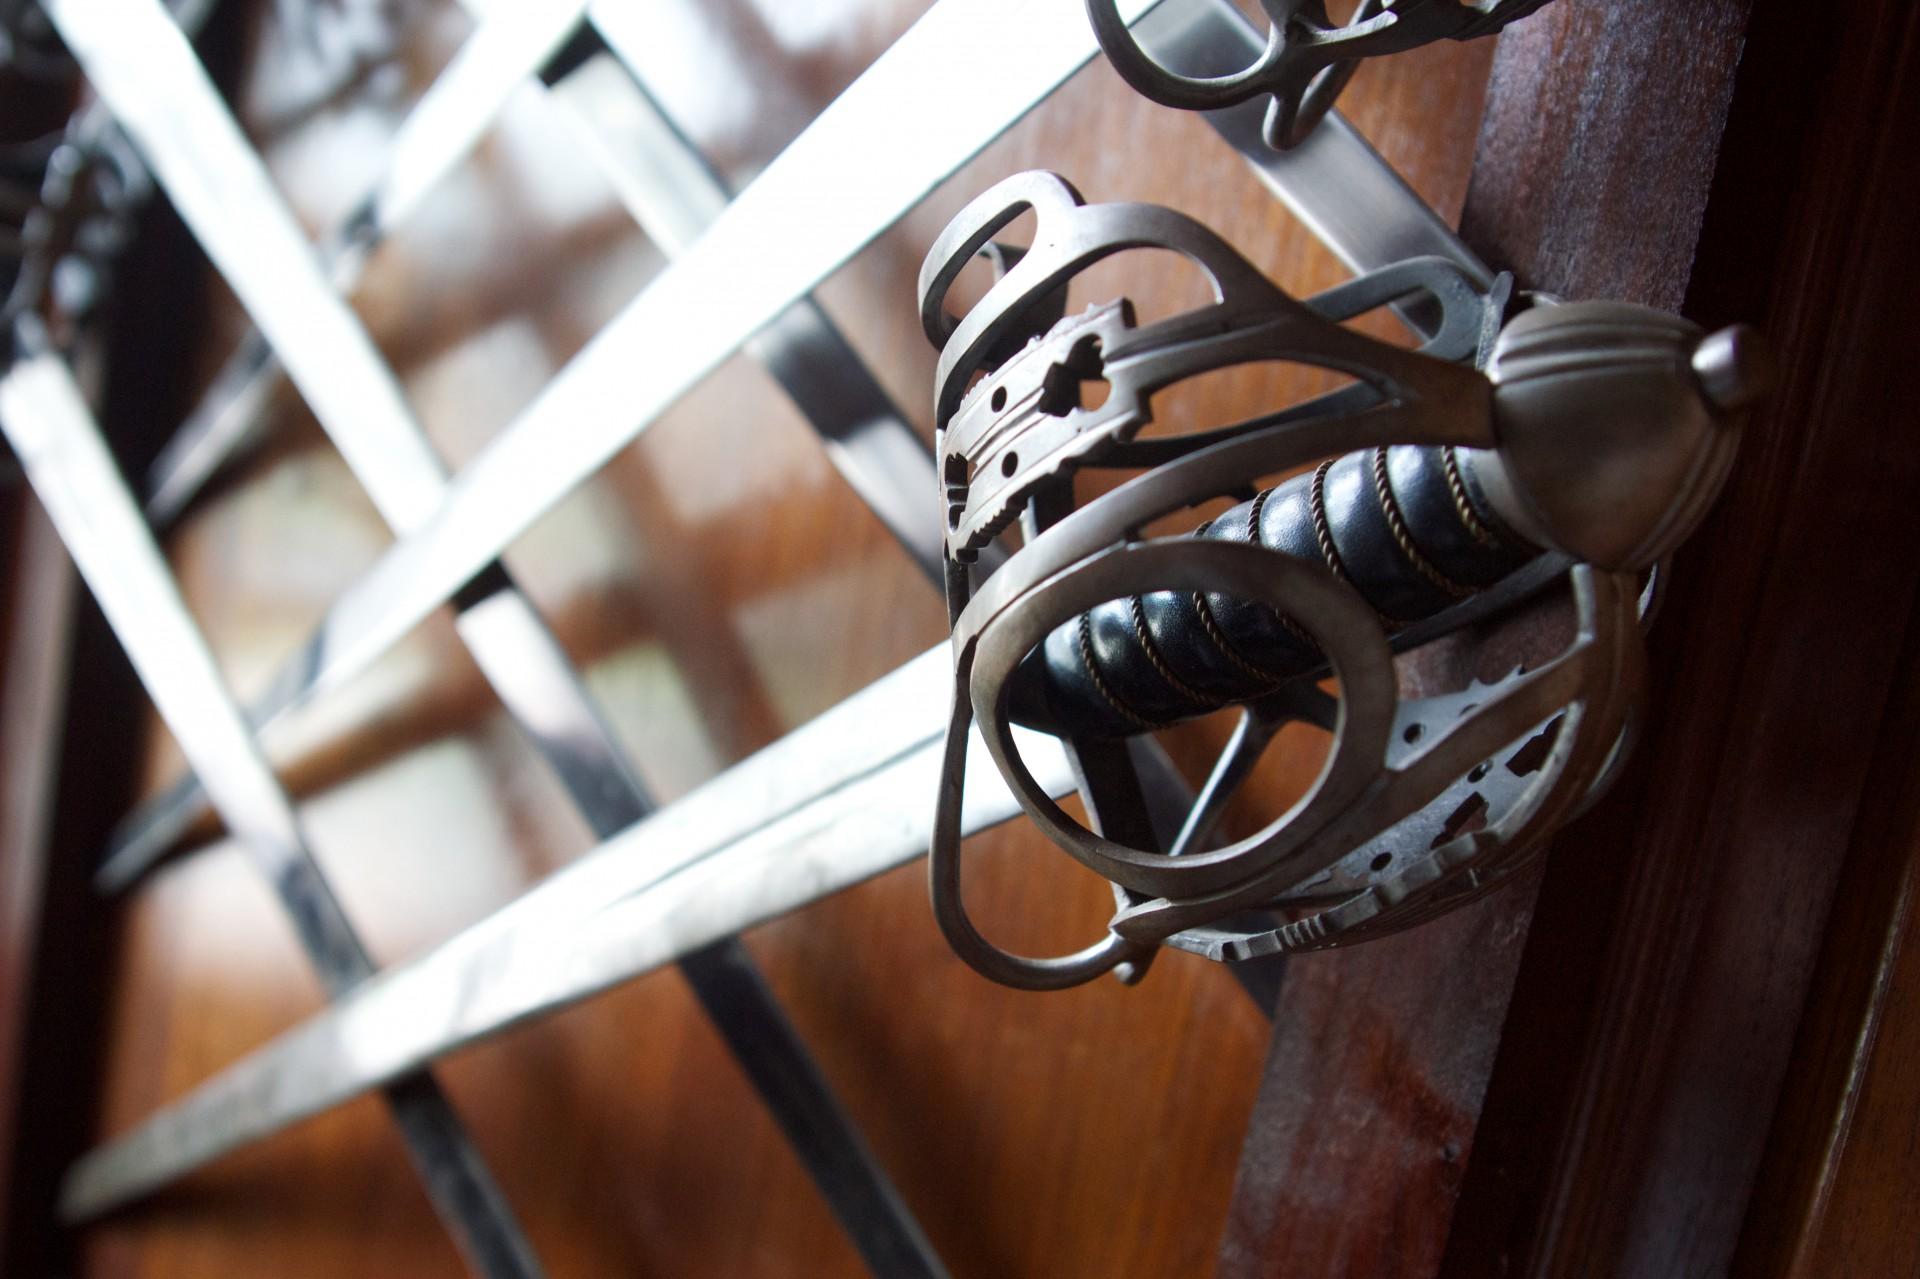 basket hilt broadsword claymore